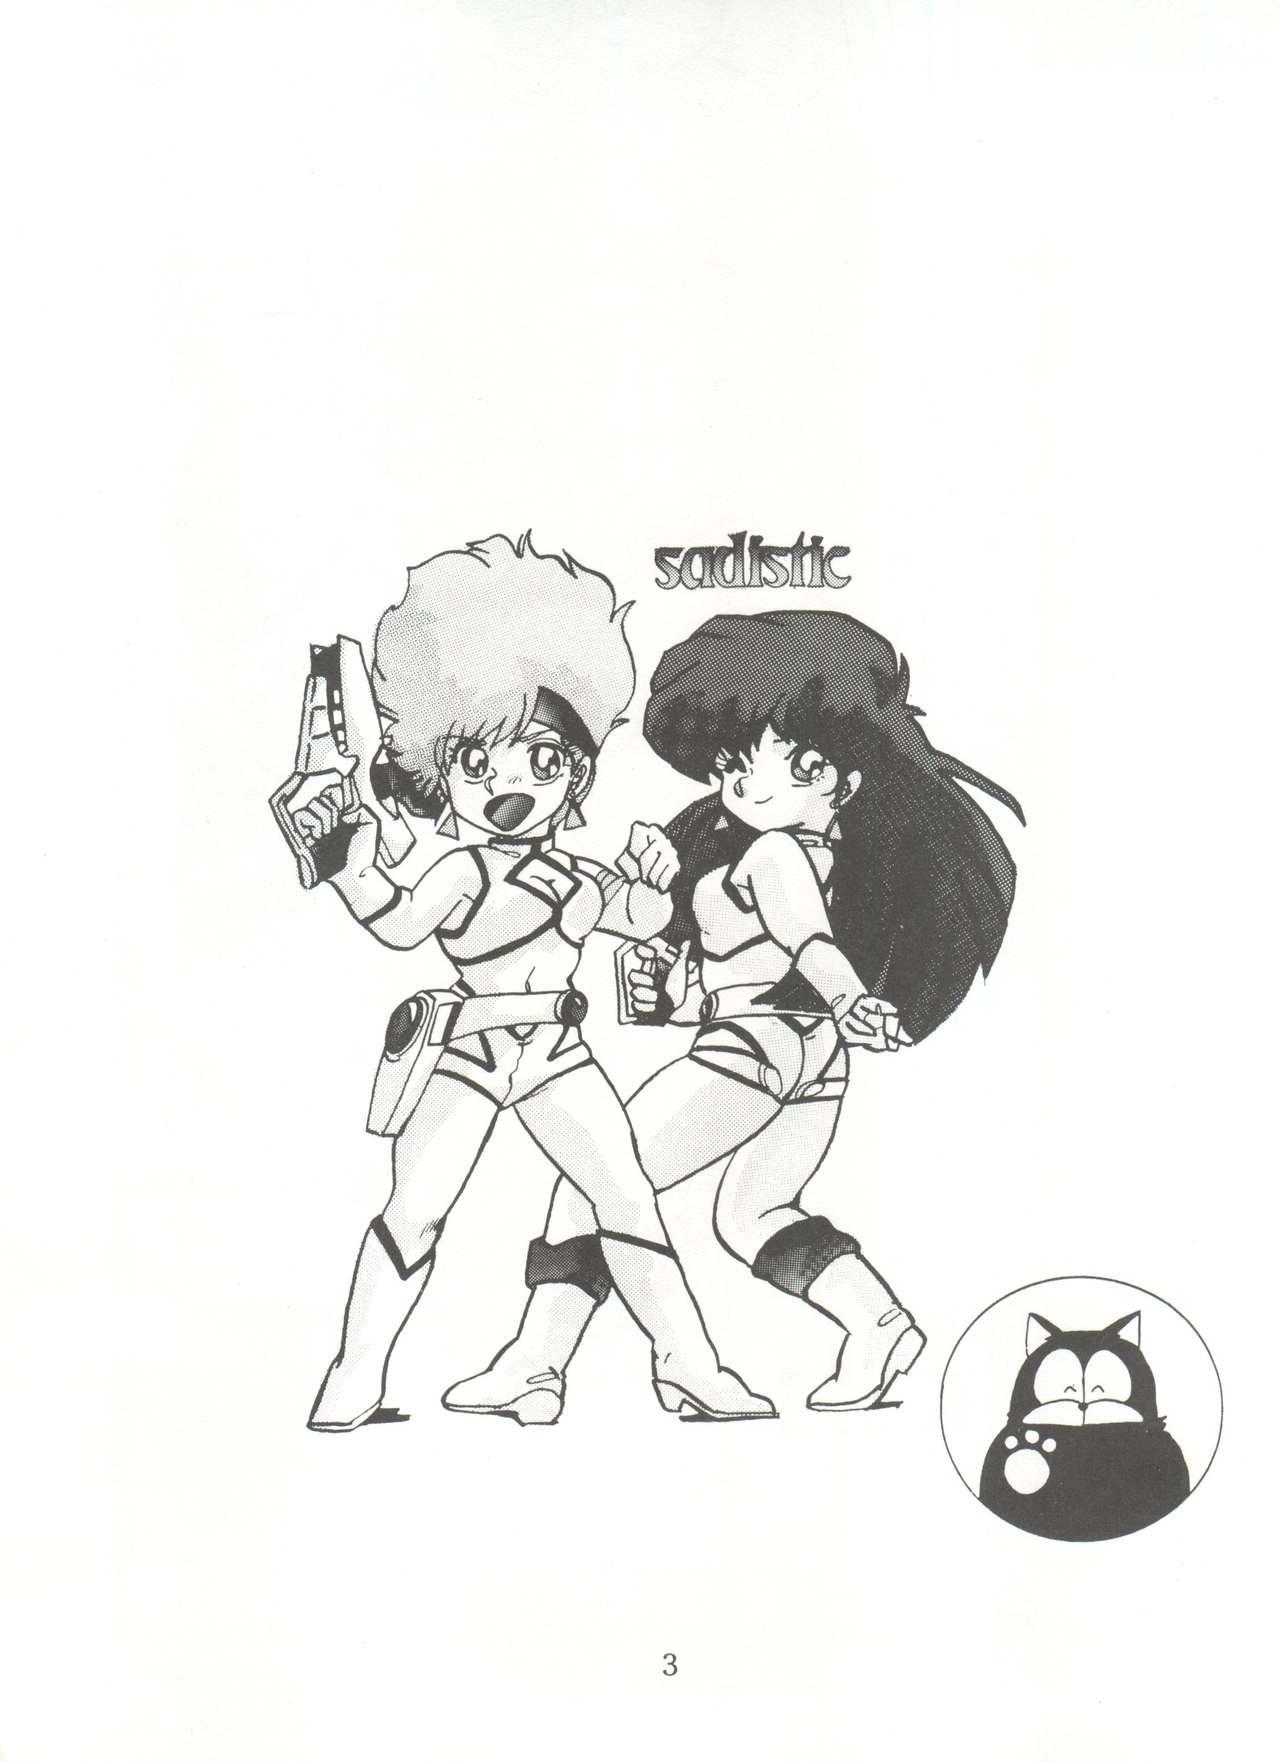 [Global One (MARO)] Sadistic 5 (Cutey Honey, Devilman, Sailor Moon), [Global One (MARO)] Sadistic (Dirty Pair, Fushigi no Umi no Nadia, Sailor Moon), [Studio Ikkatsumajin] .ribbon (Hime-chan's Ribbon) 62